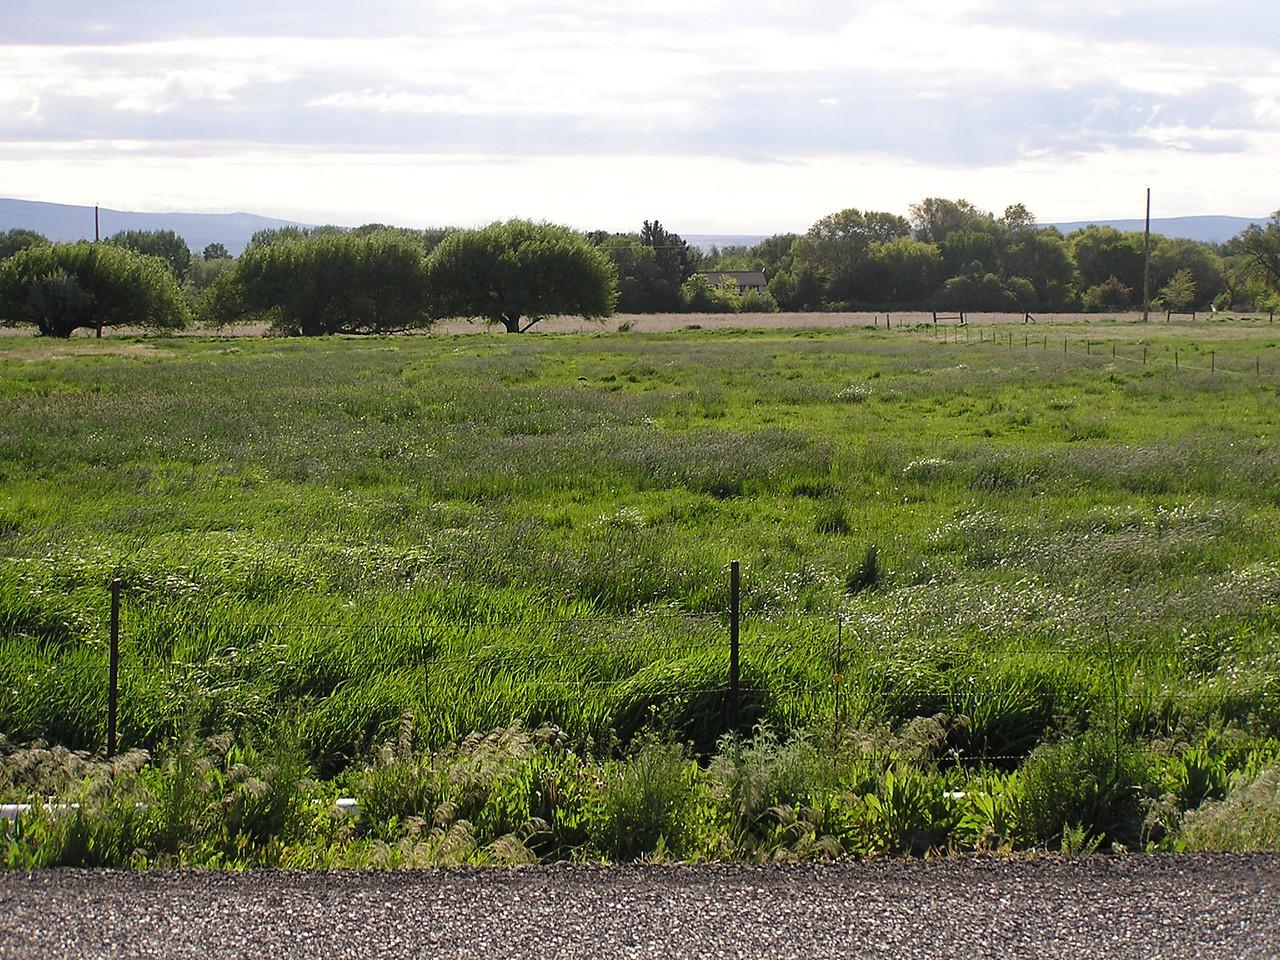 Farm fields.